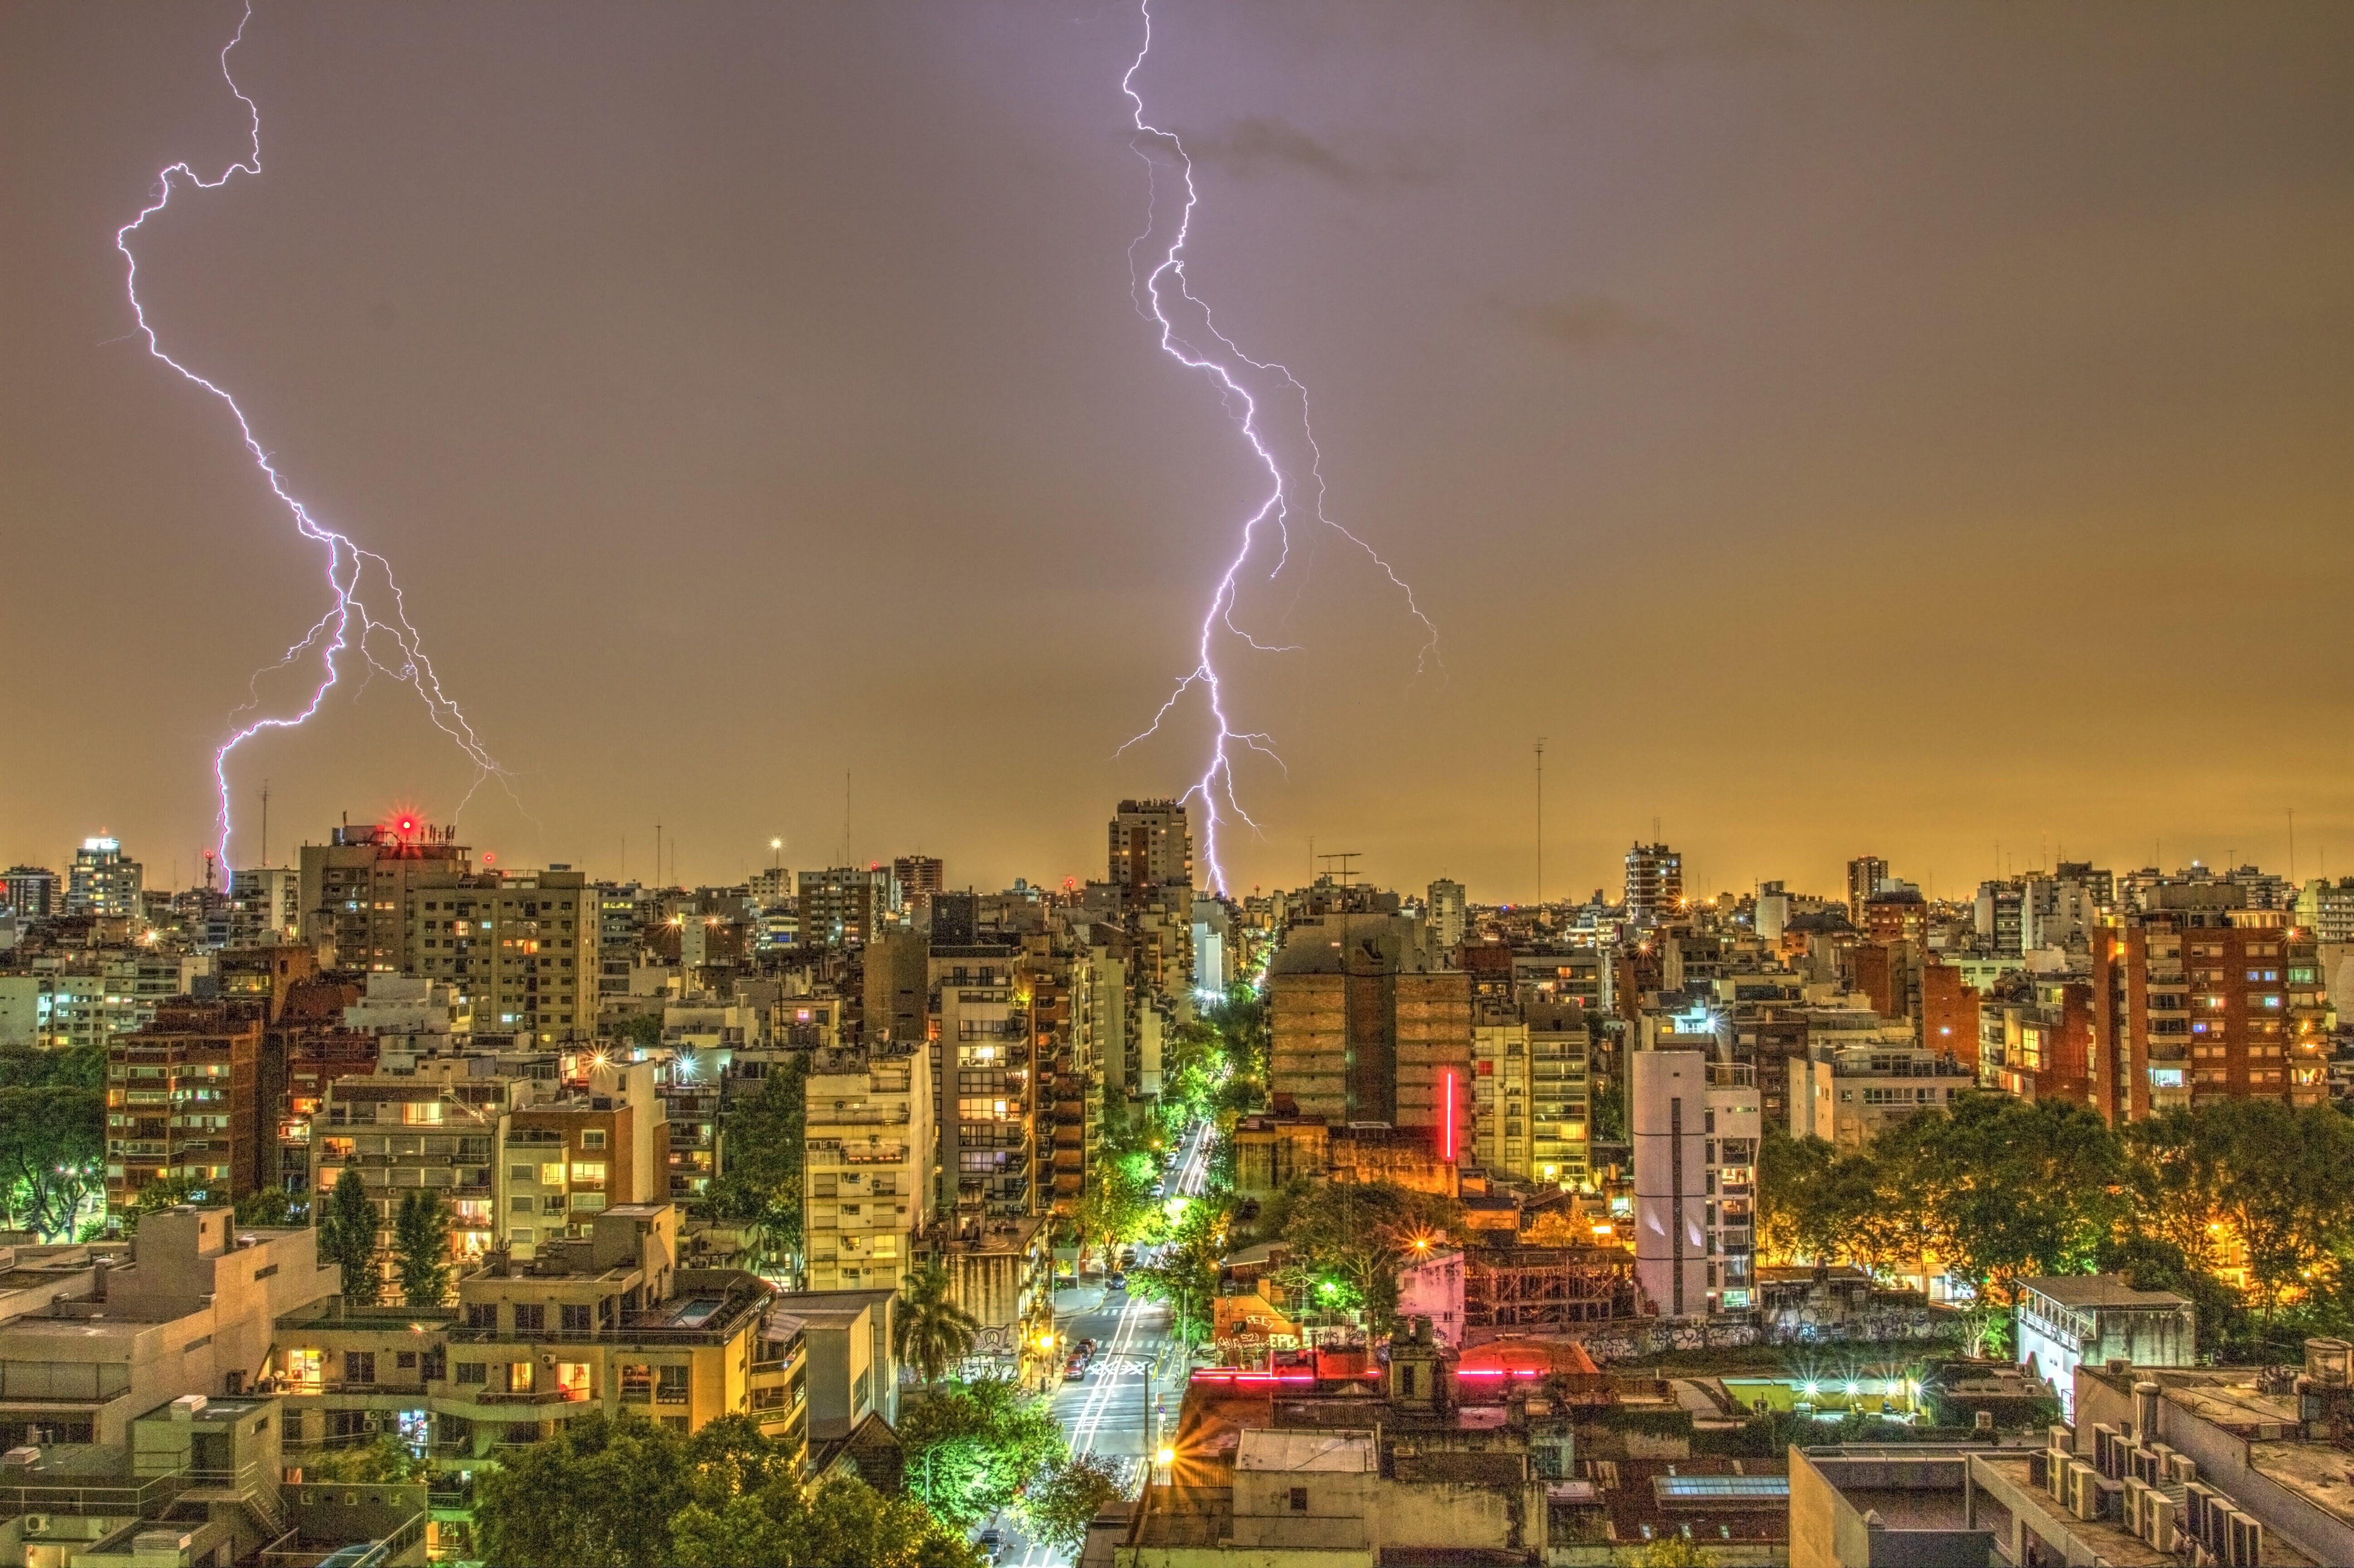 Photography of Thunder Strike Behind City